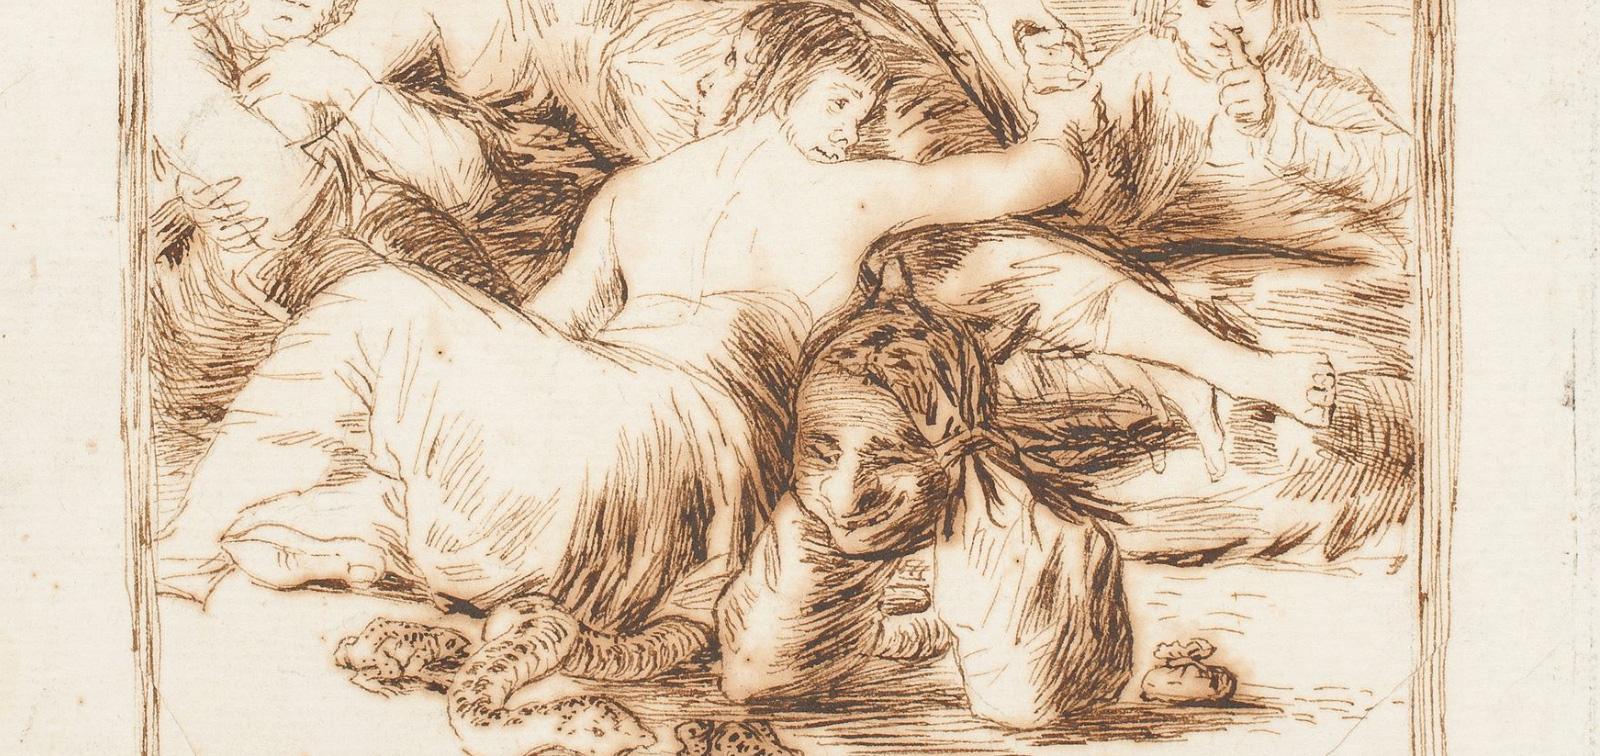 Goya. The Butterfly Bull